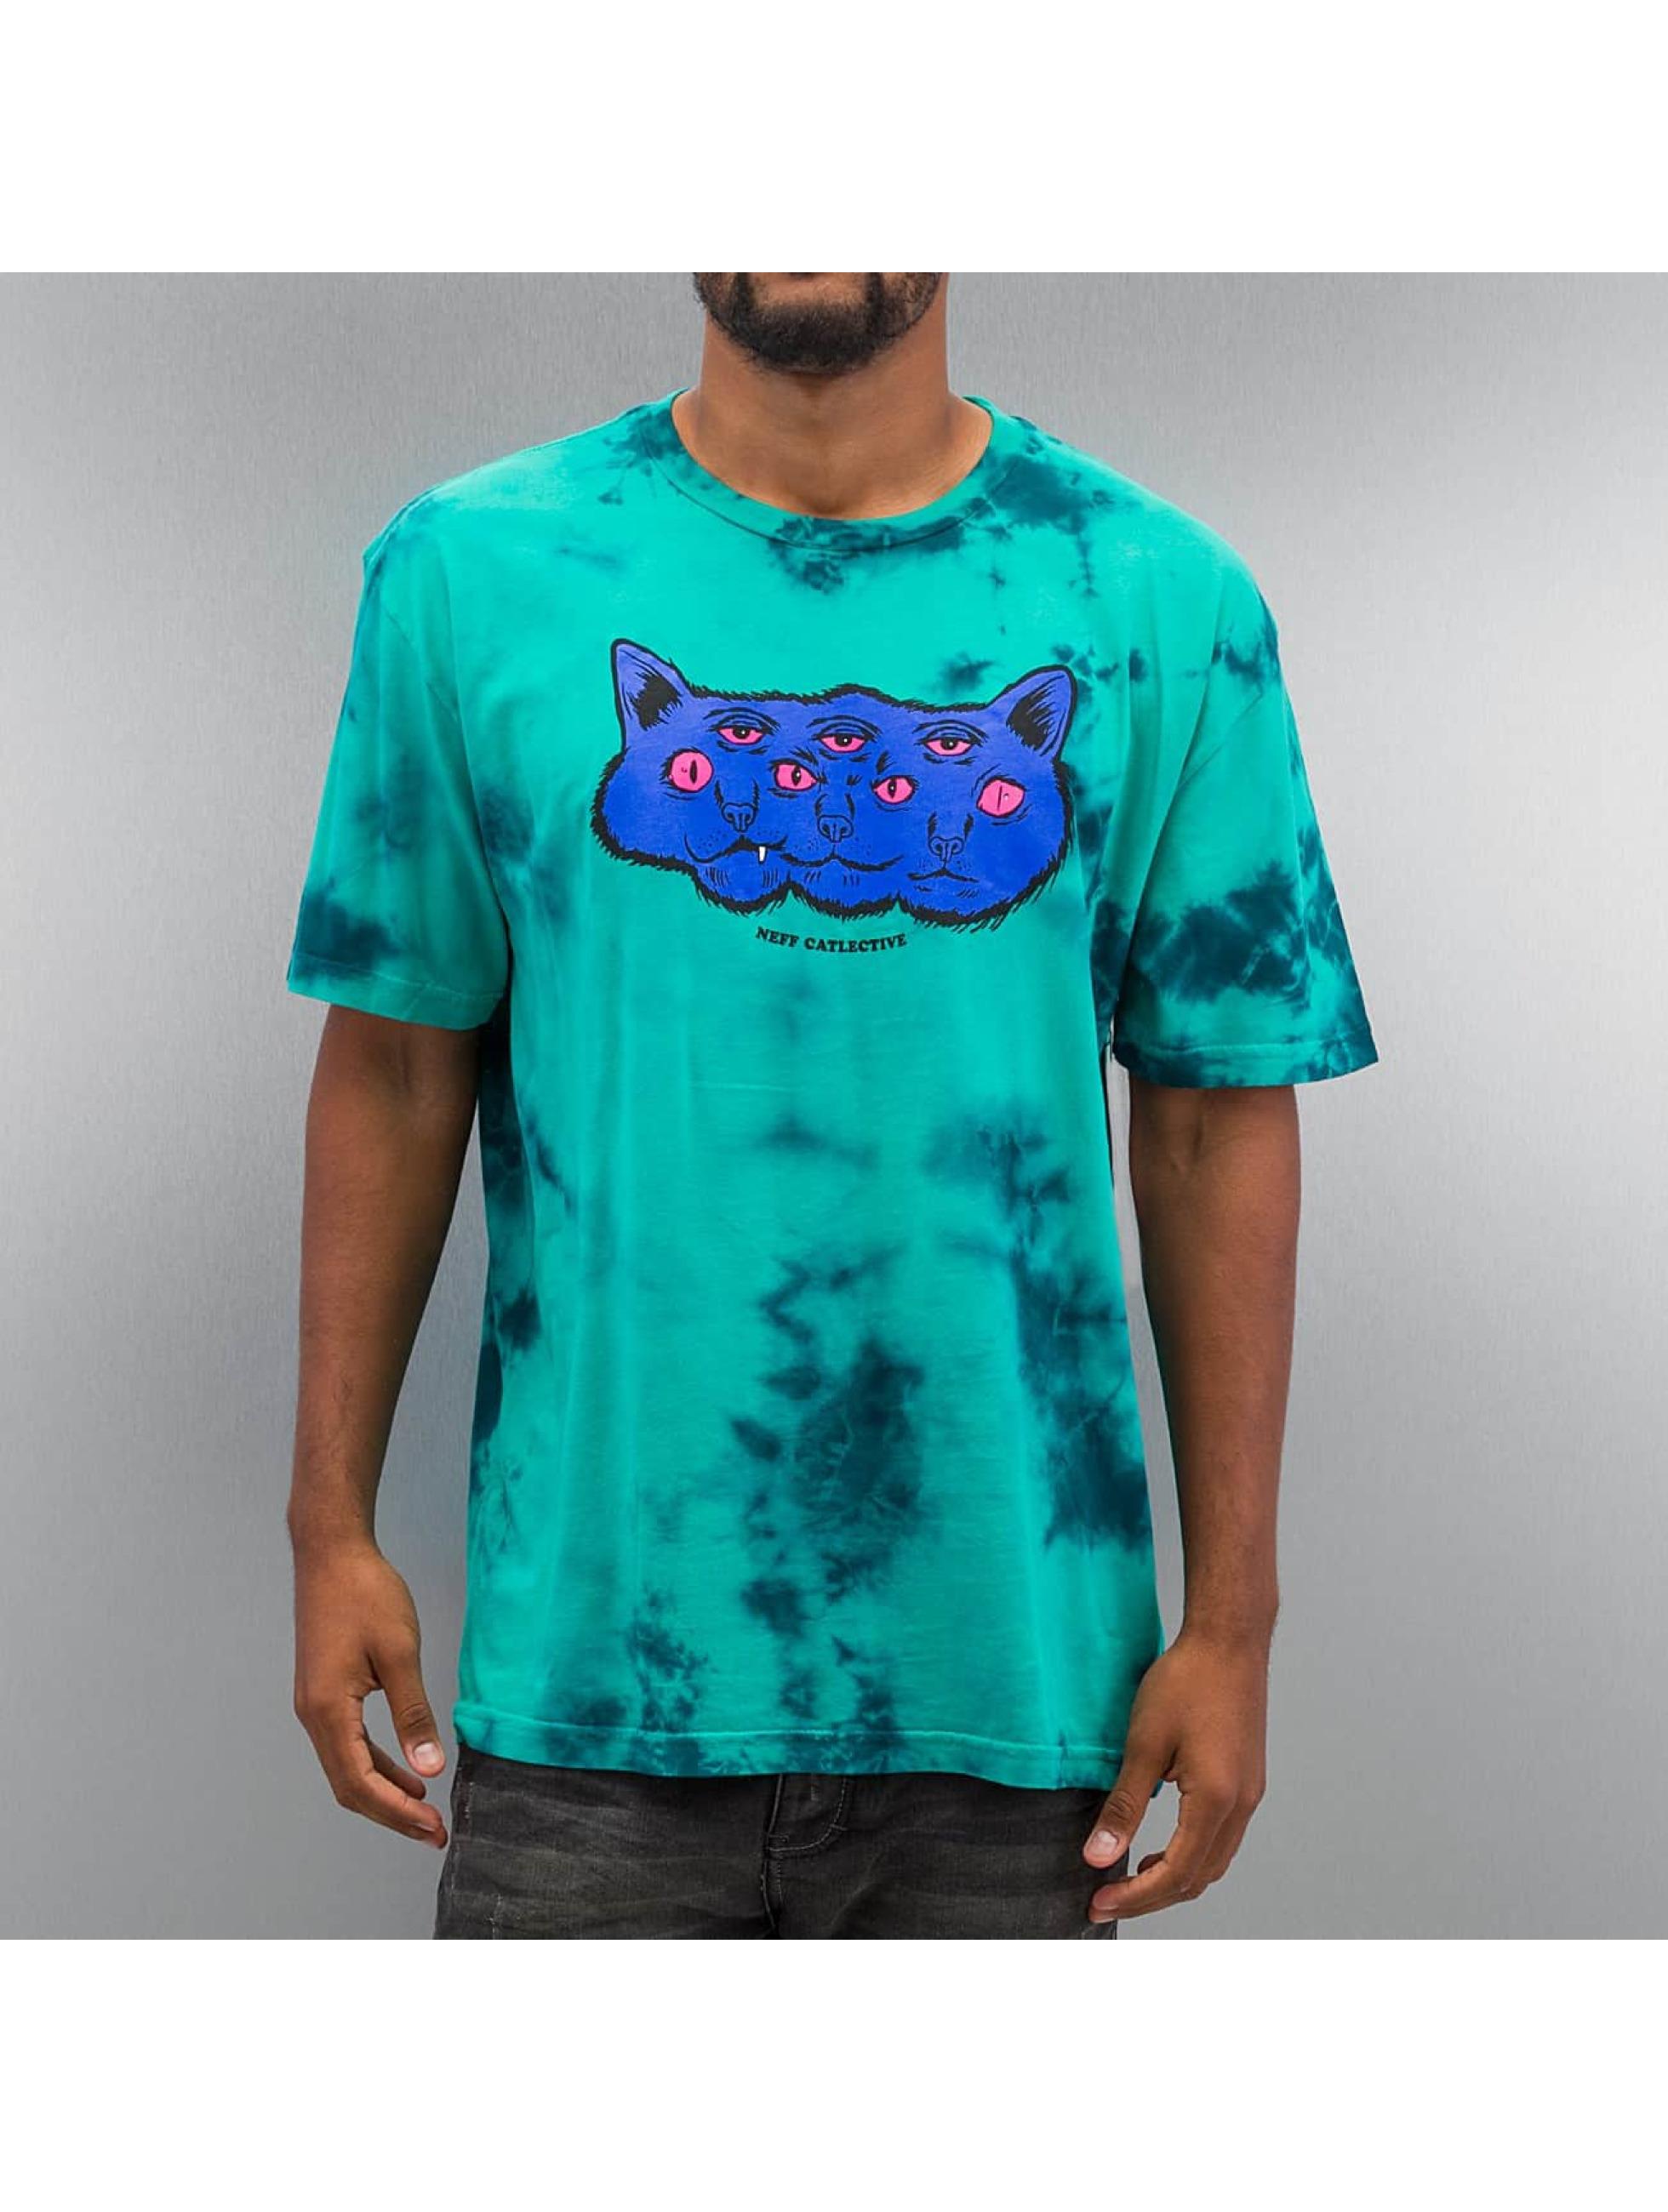 NEFF T-skjorter Catlective turkis